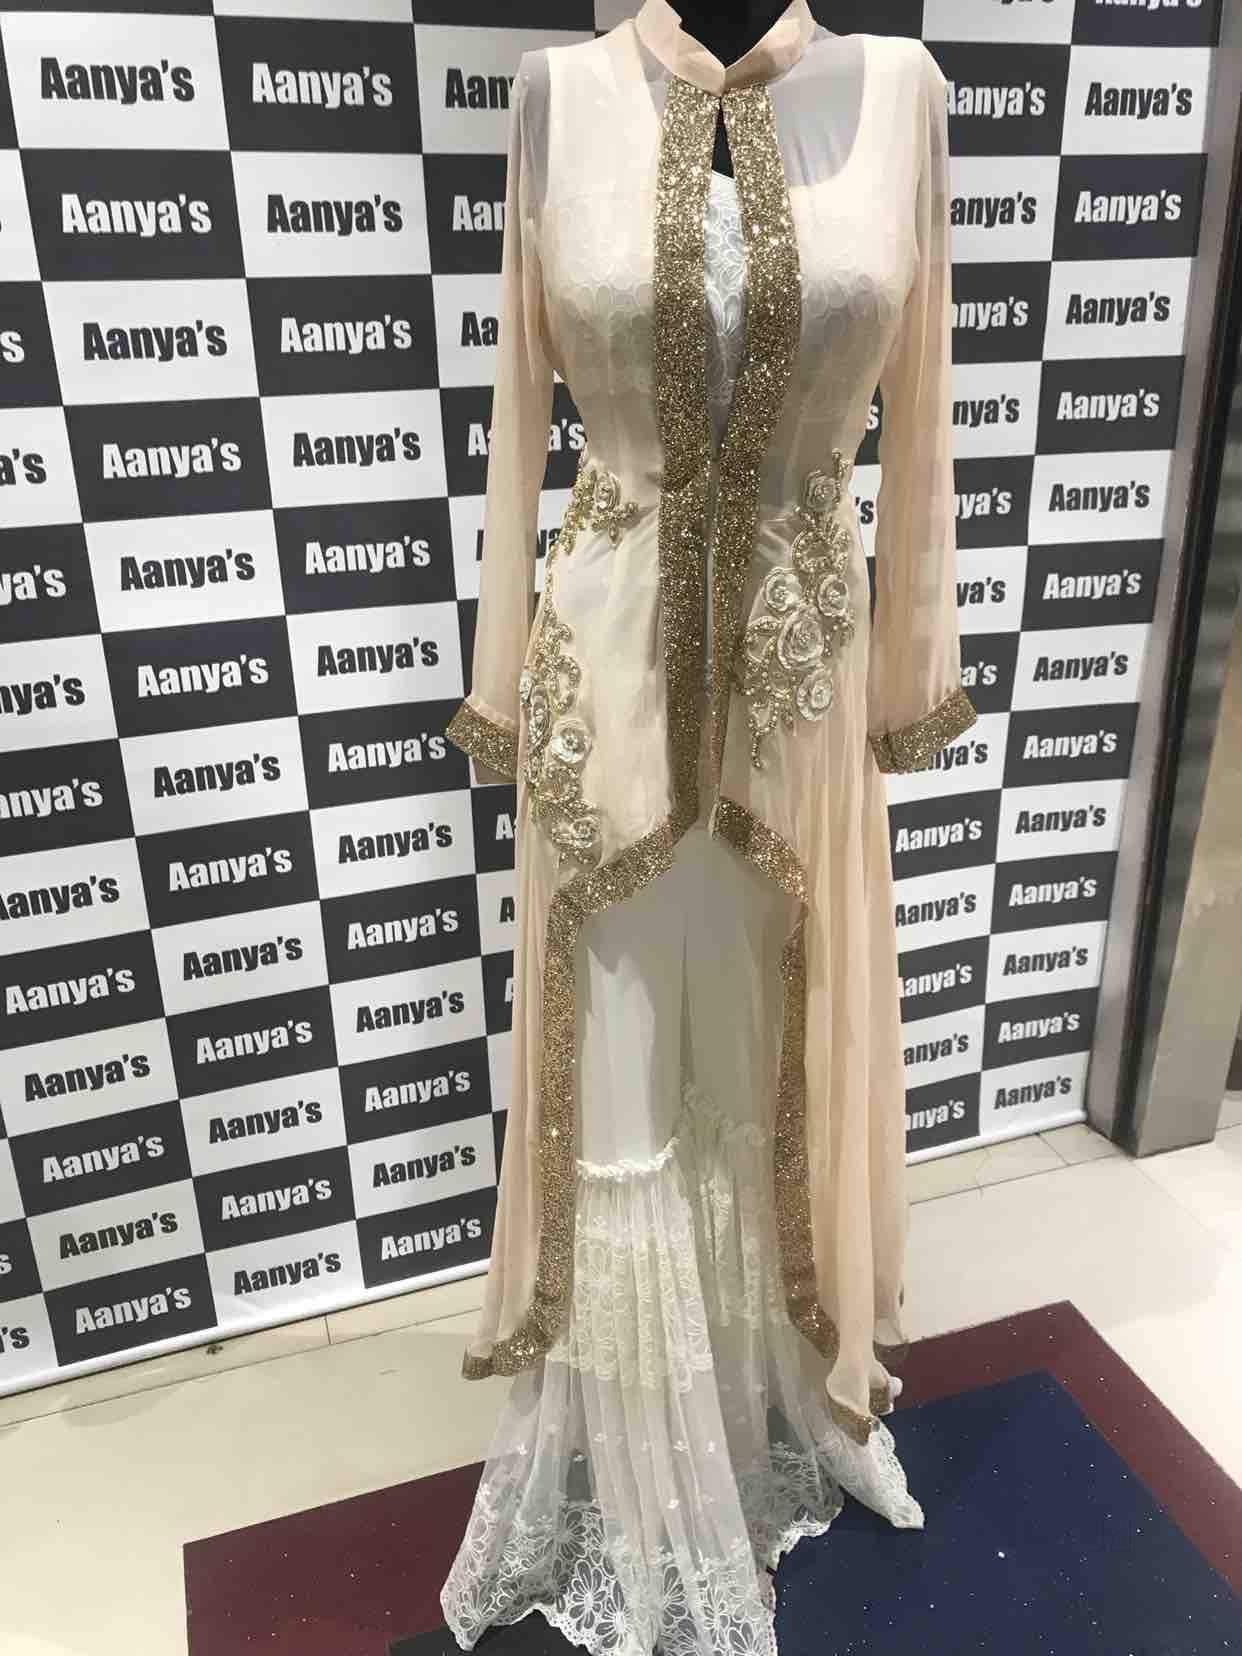 Amber Designers Wear Bandra West Fashion Designers In Mumbai Justdial